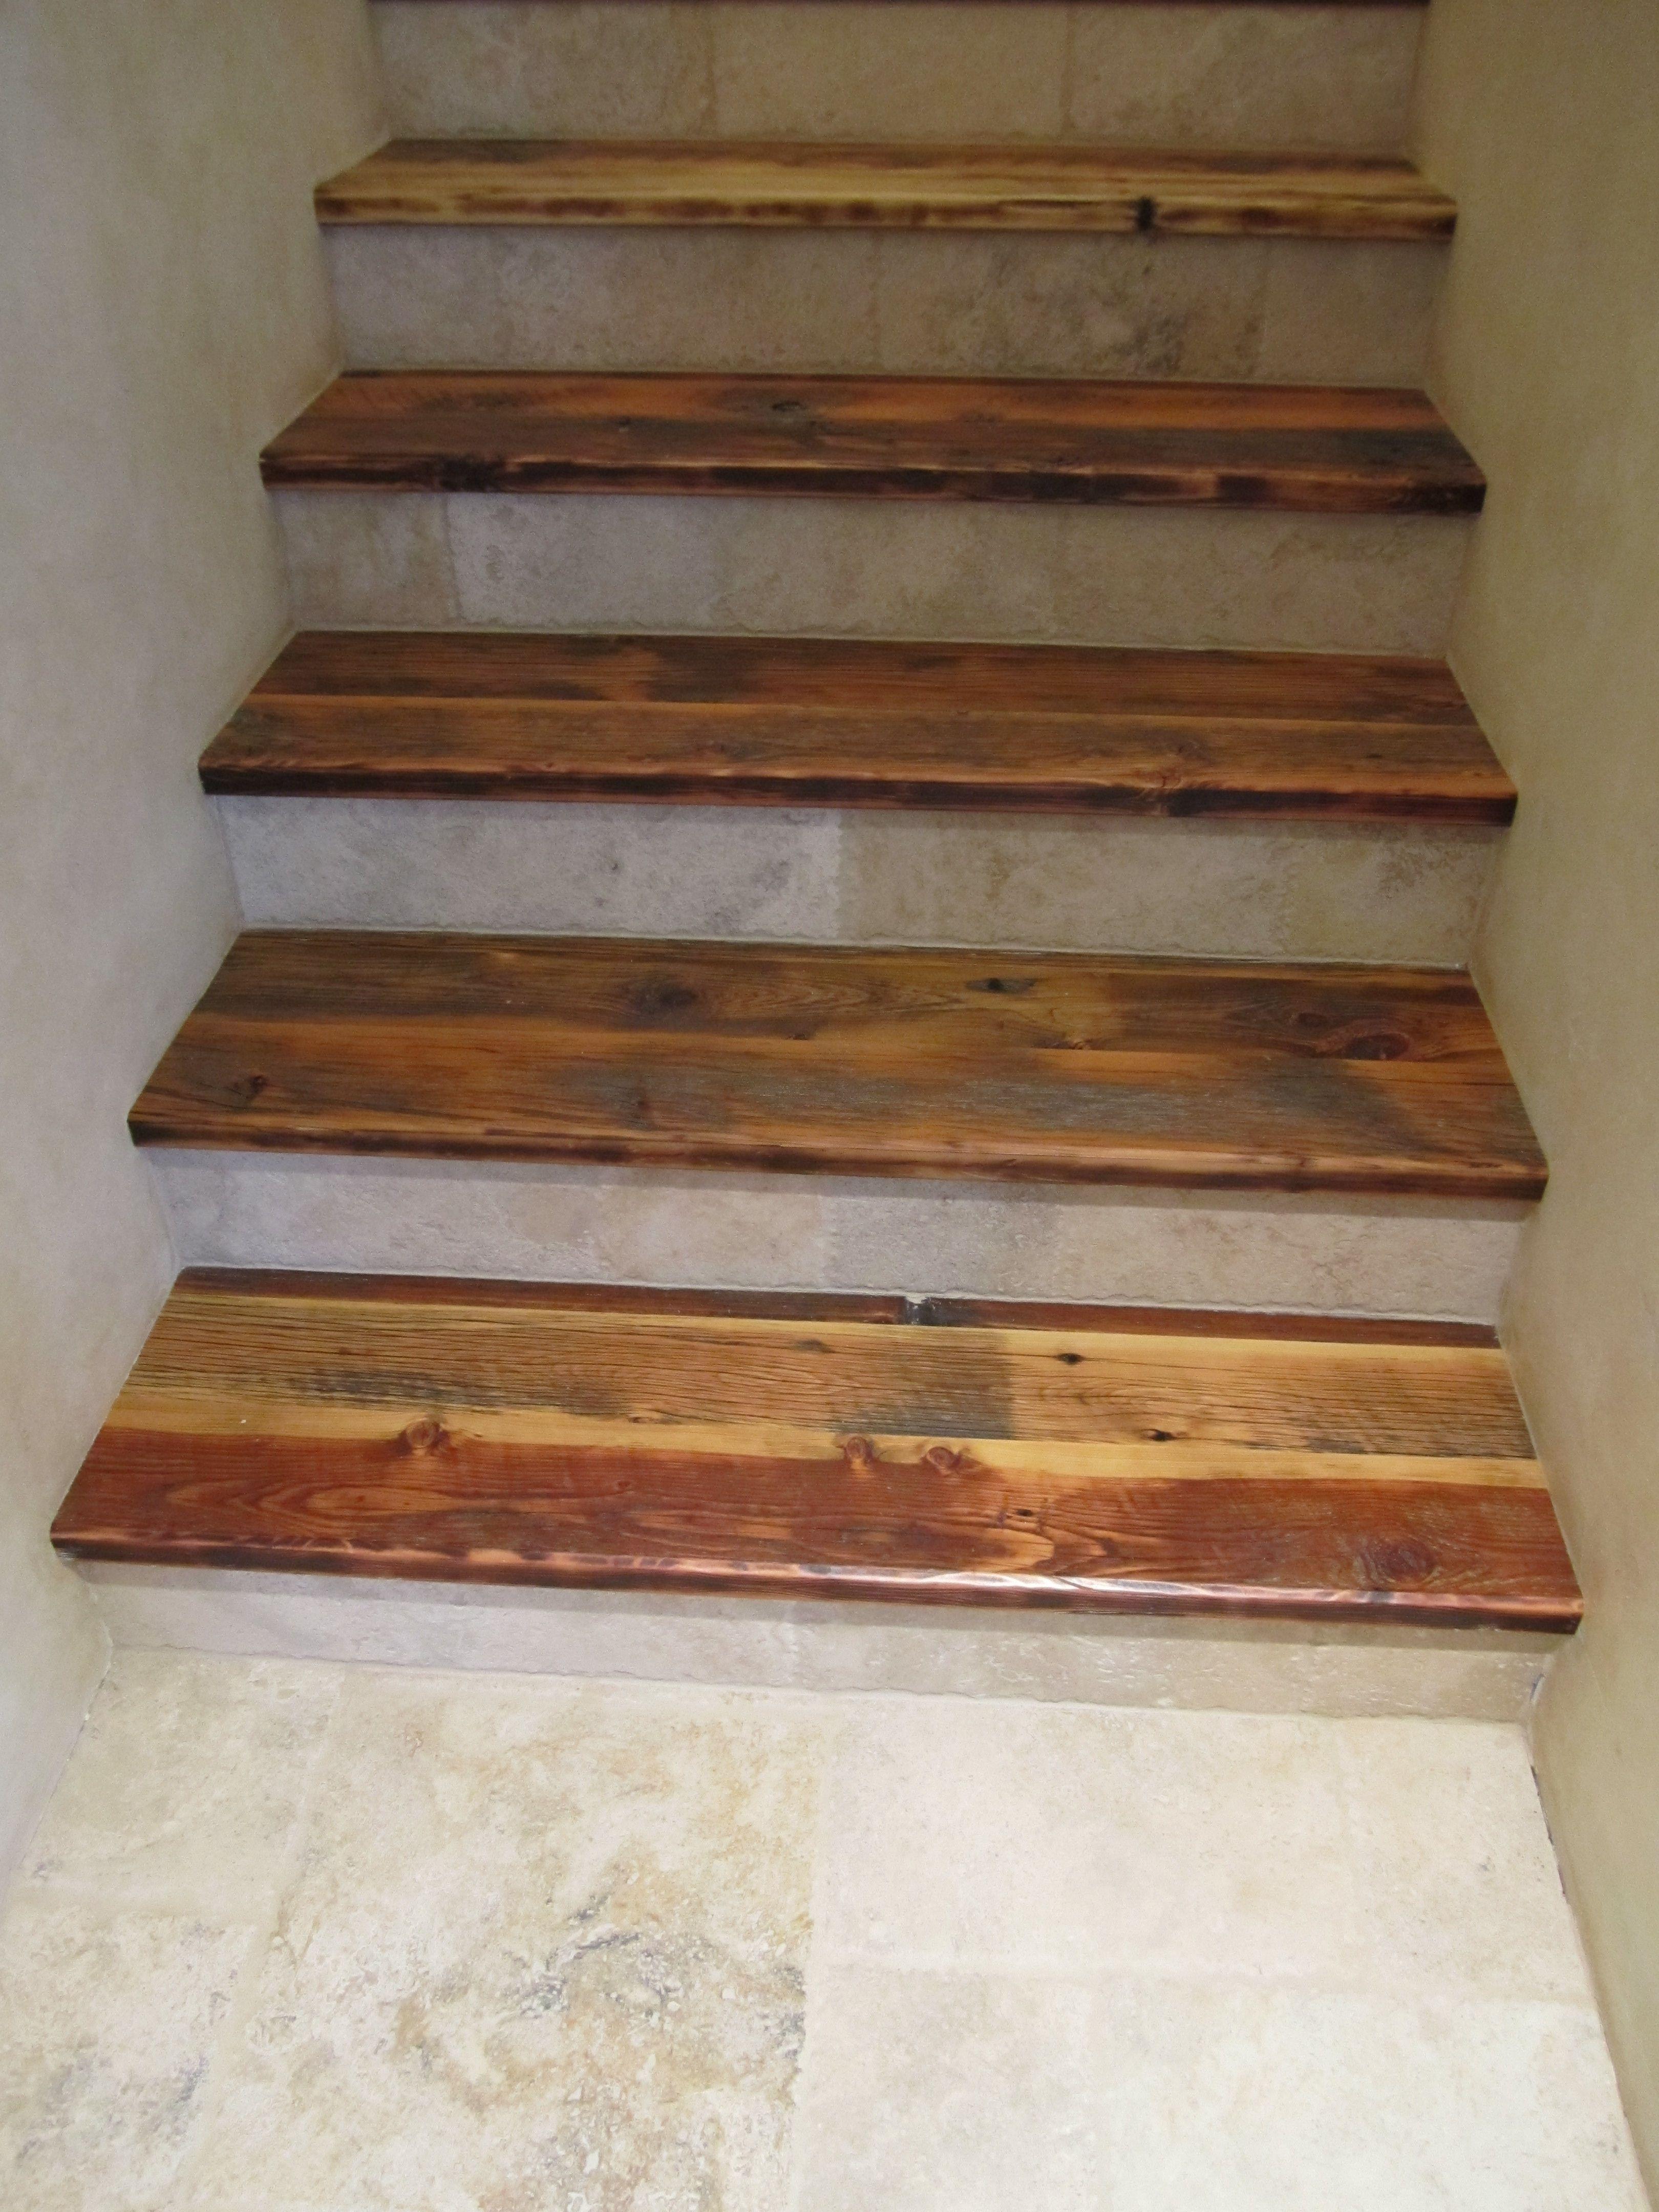 Montana Reclaimed Lumber Wood Stair Treads Rustic Stairs Wood | Rustic Wood Stair Treads | Indoor Stair | Wood Plank | Interior | Reclaimed Wood | Carpet